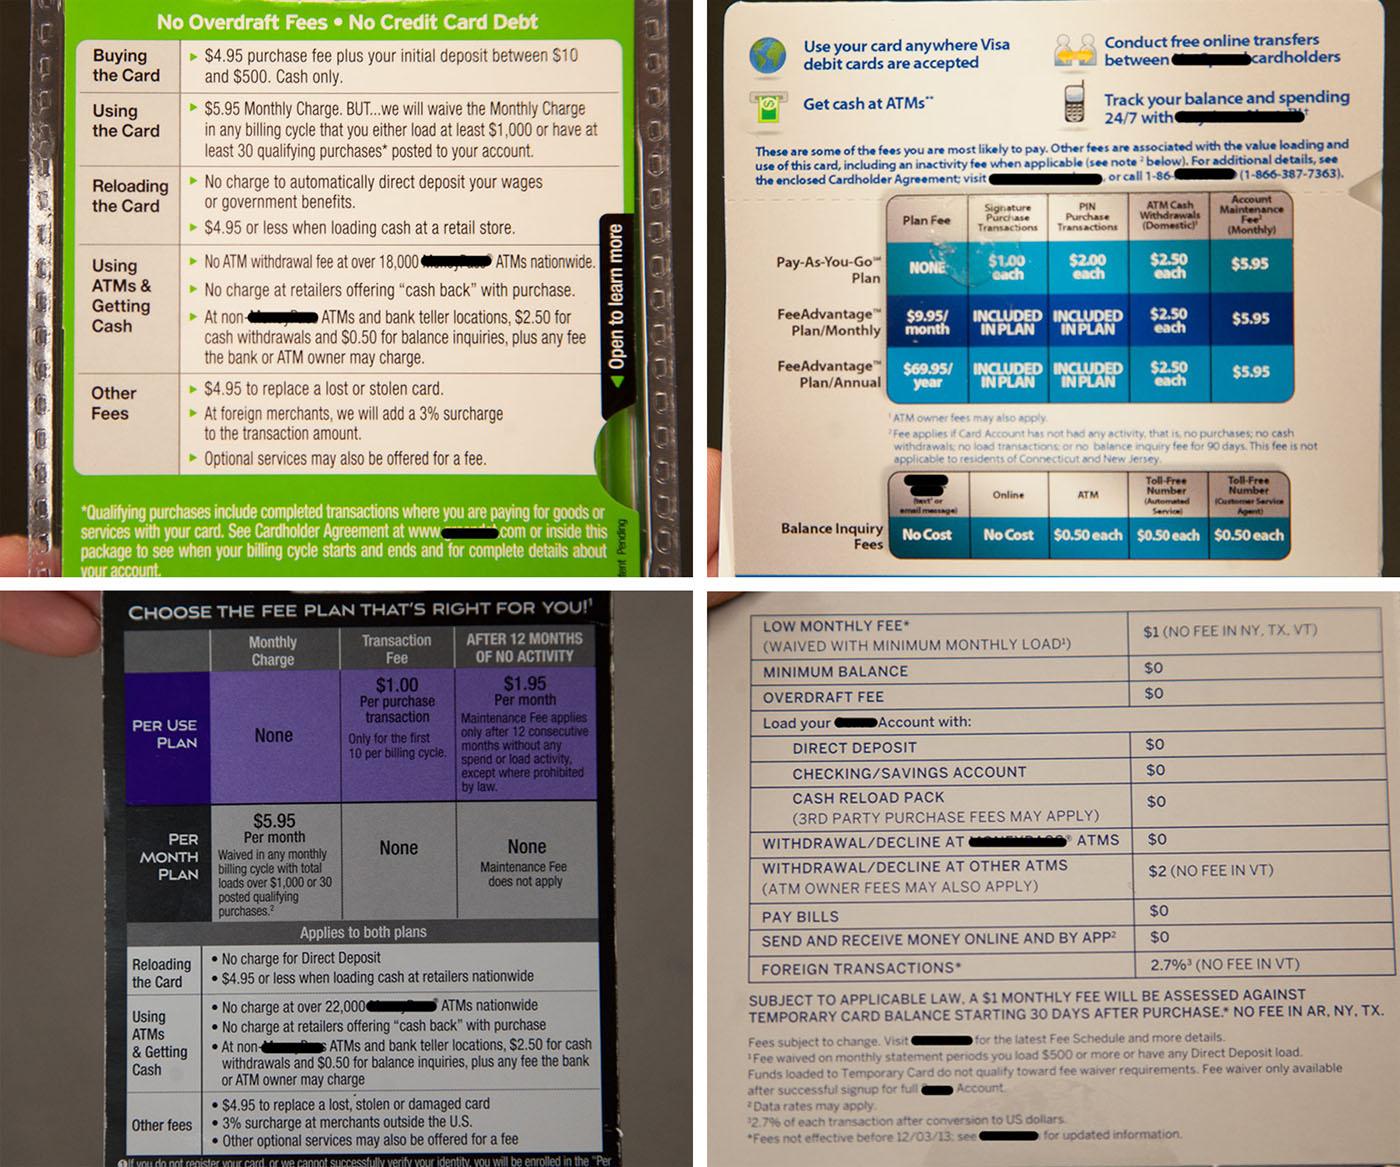 201403_cfpb_prepaid-cards-attachment-A